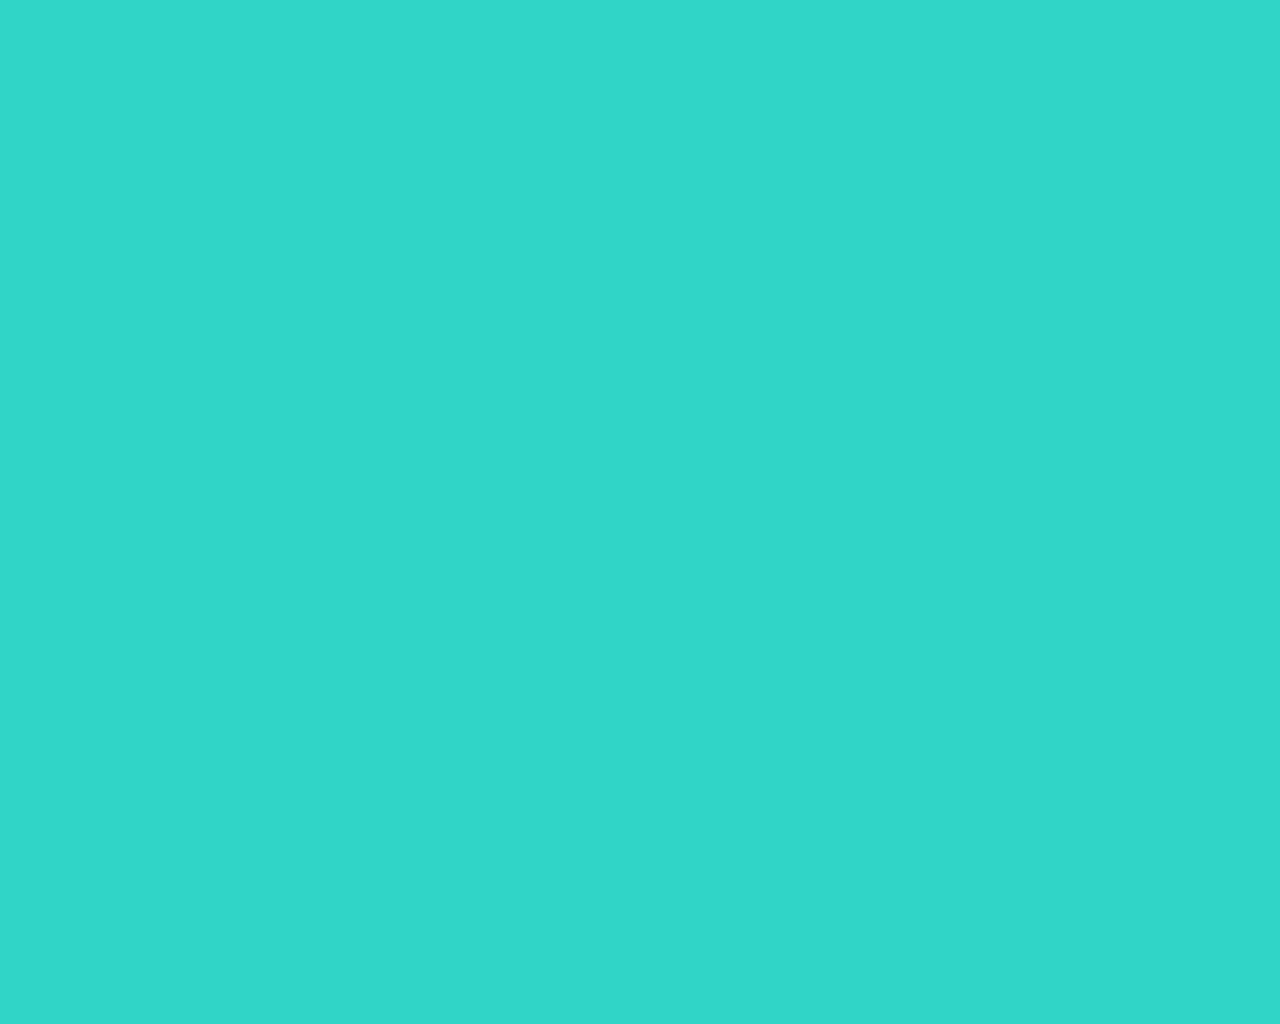 Aqua colored wallpaper wallpapersafari - Turquoise wallpaper pinterest ...